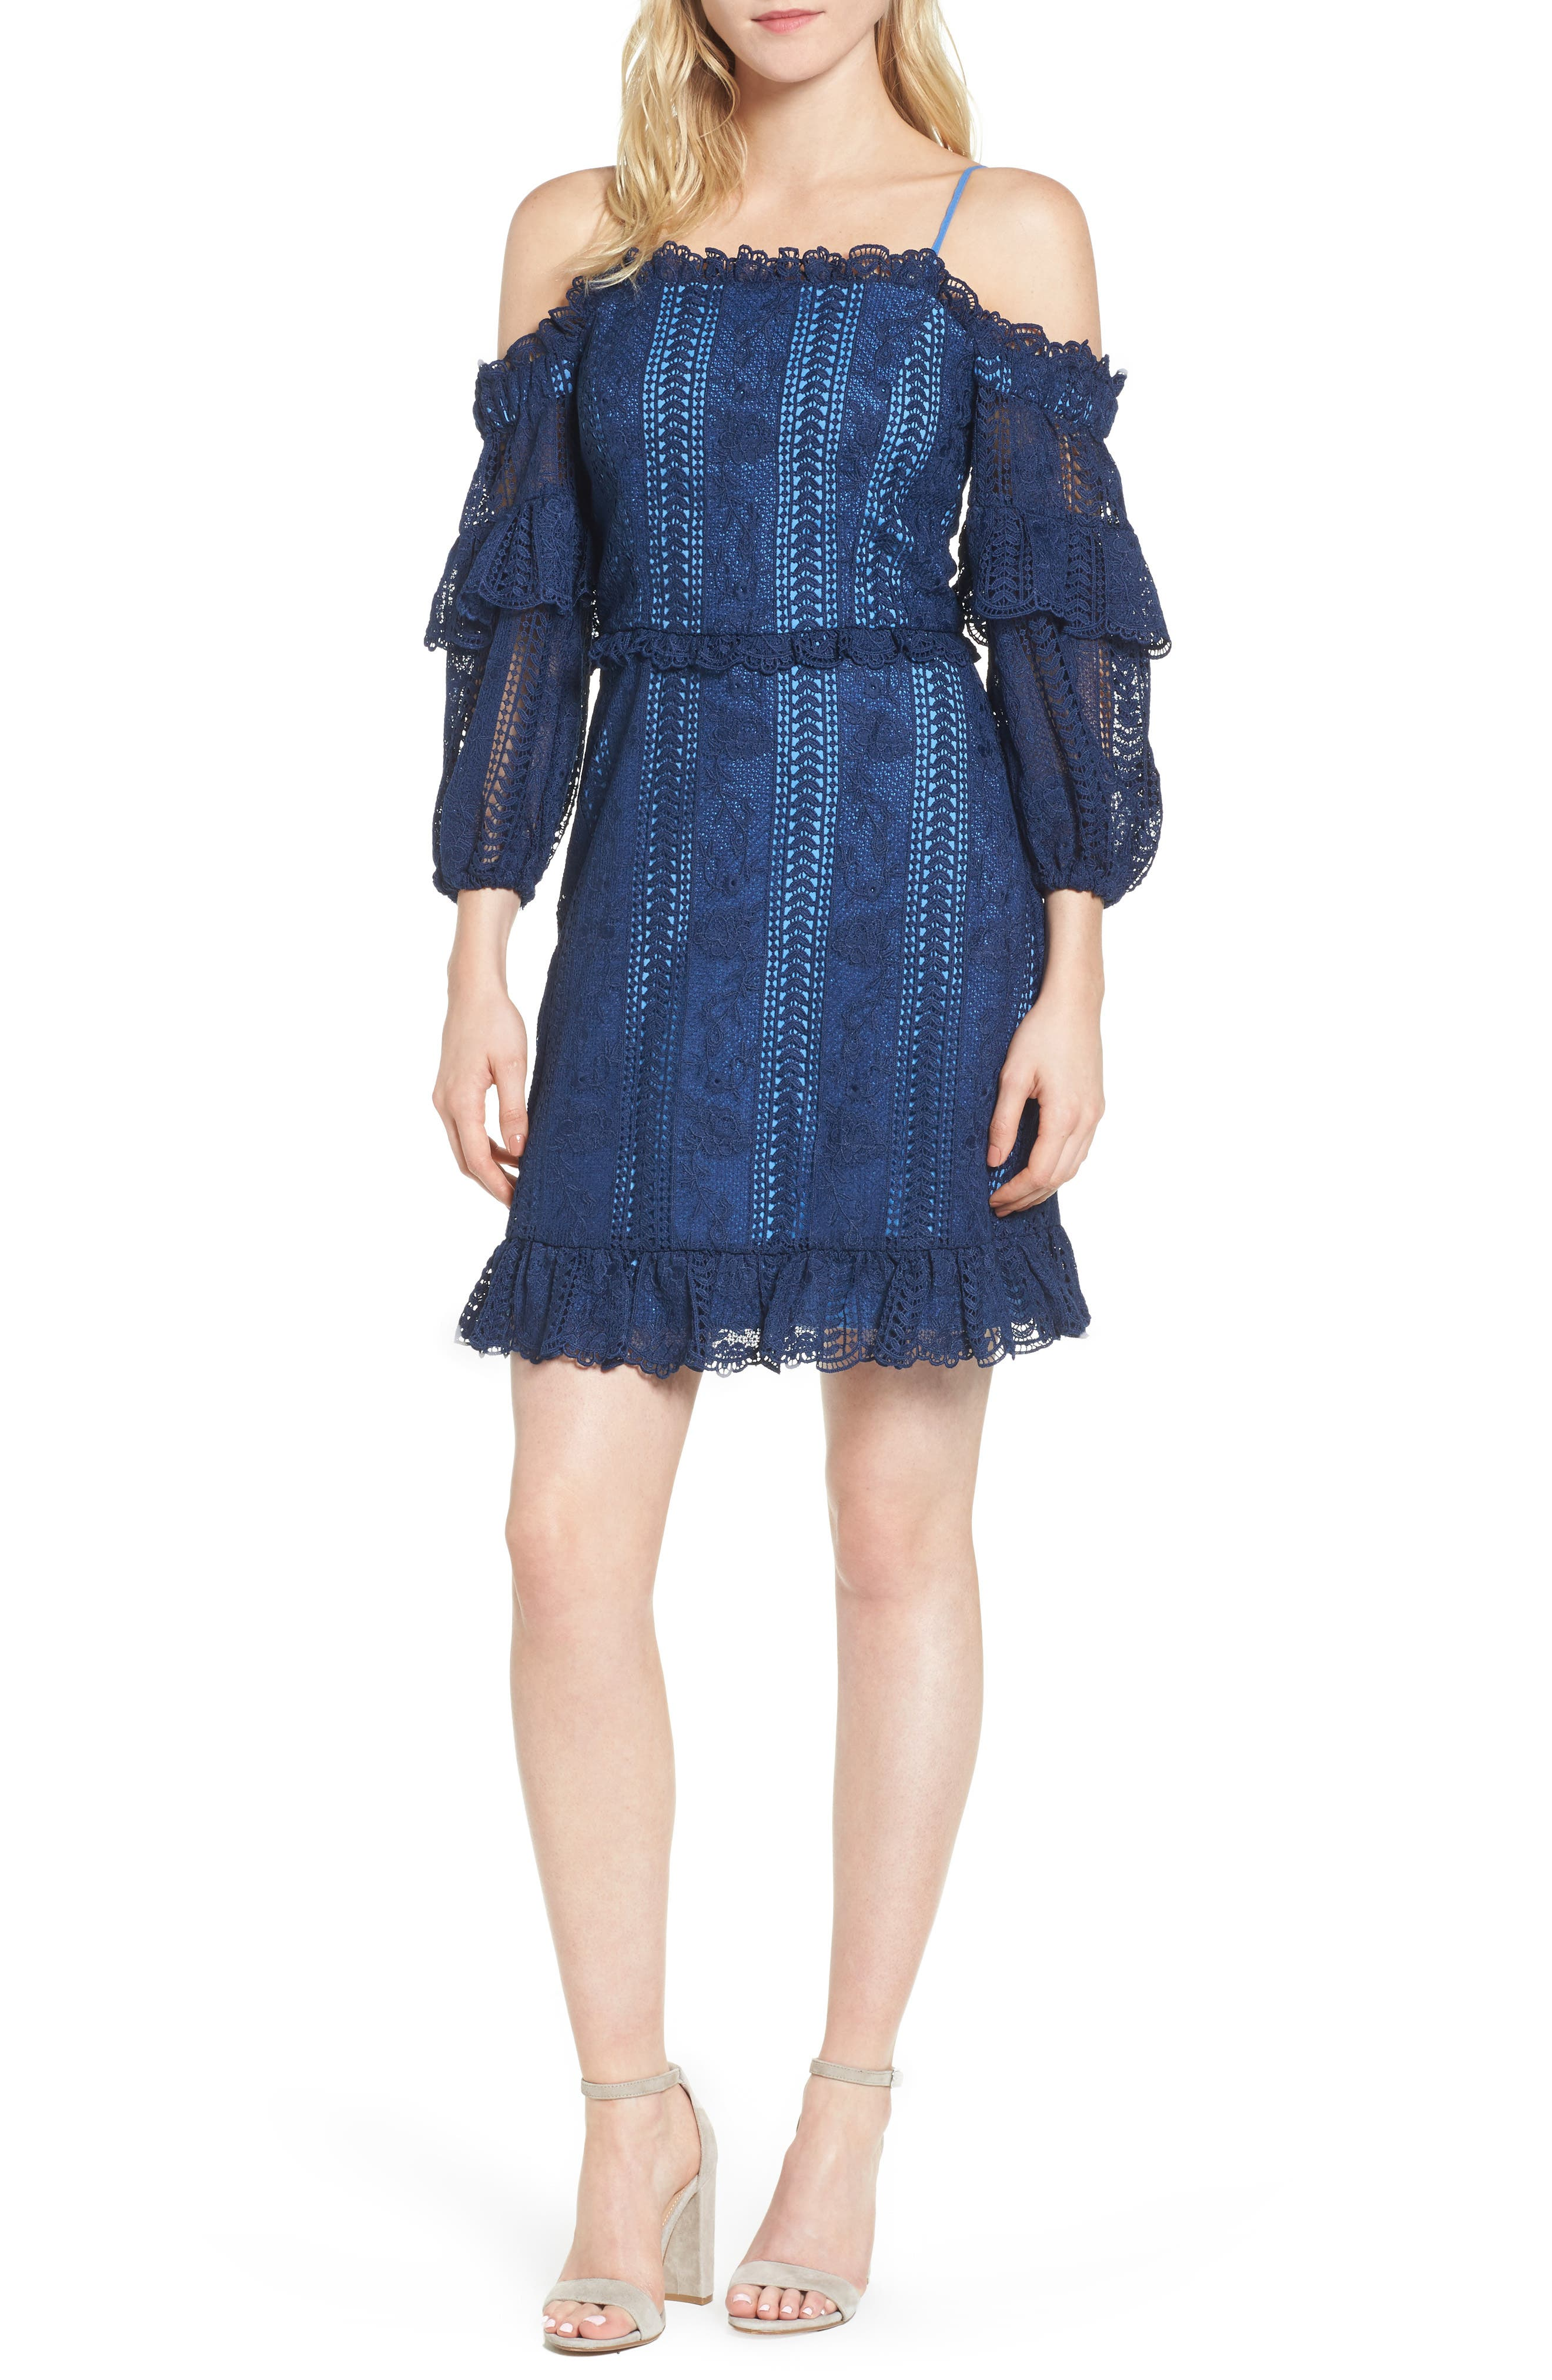 Parker Irma Lace Off the Shoulder Dress